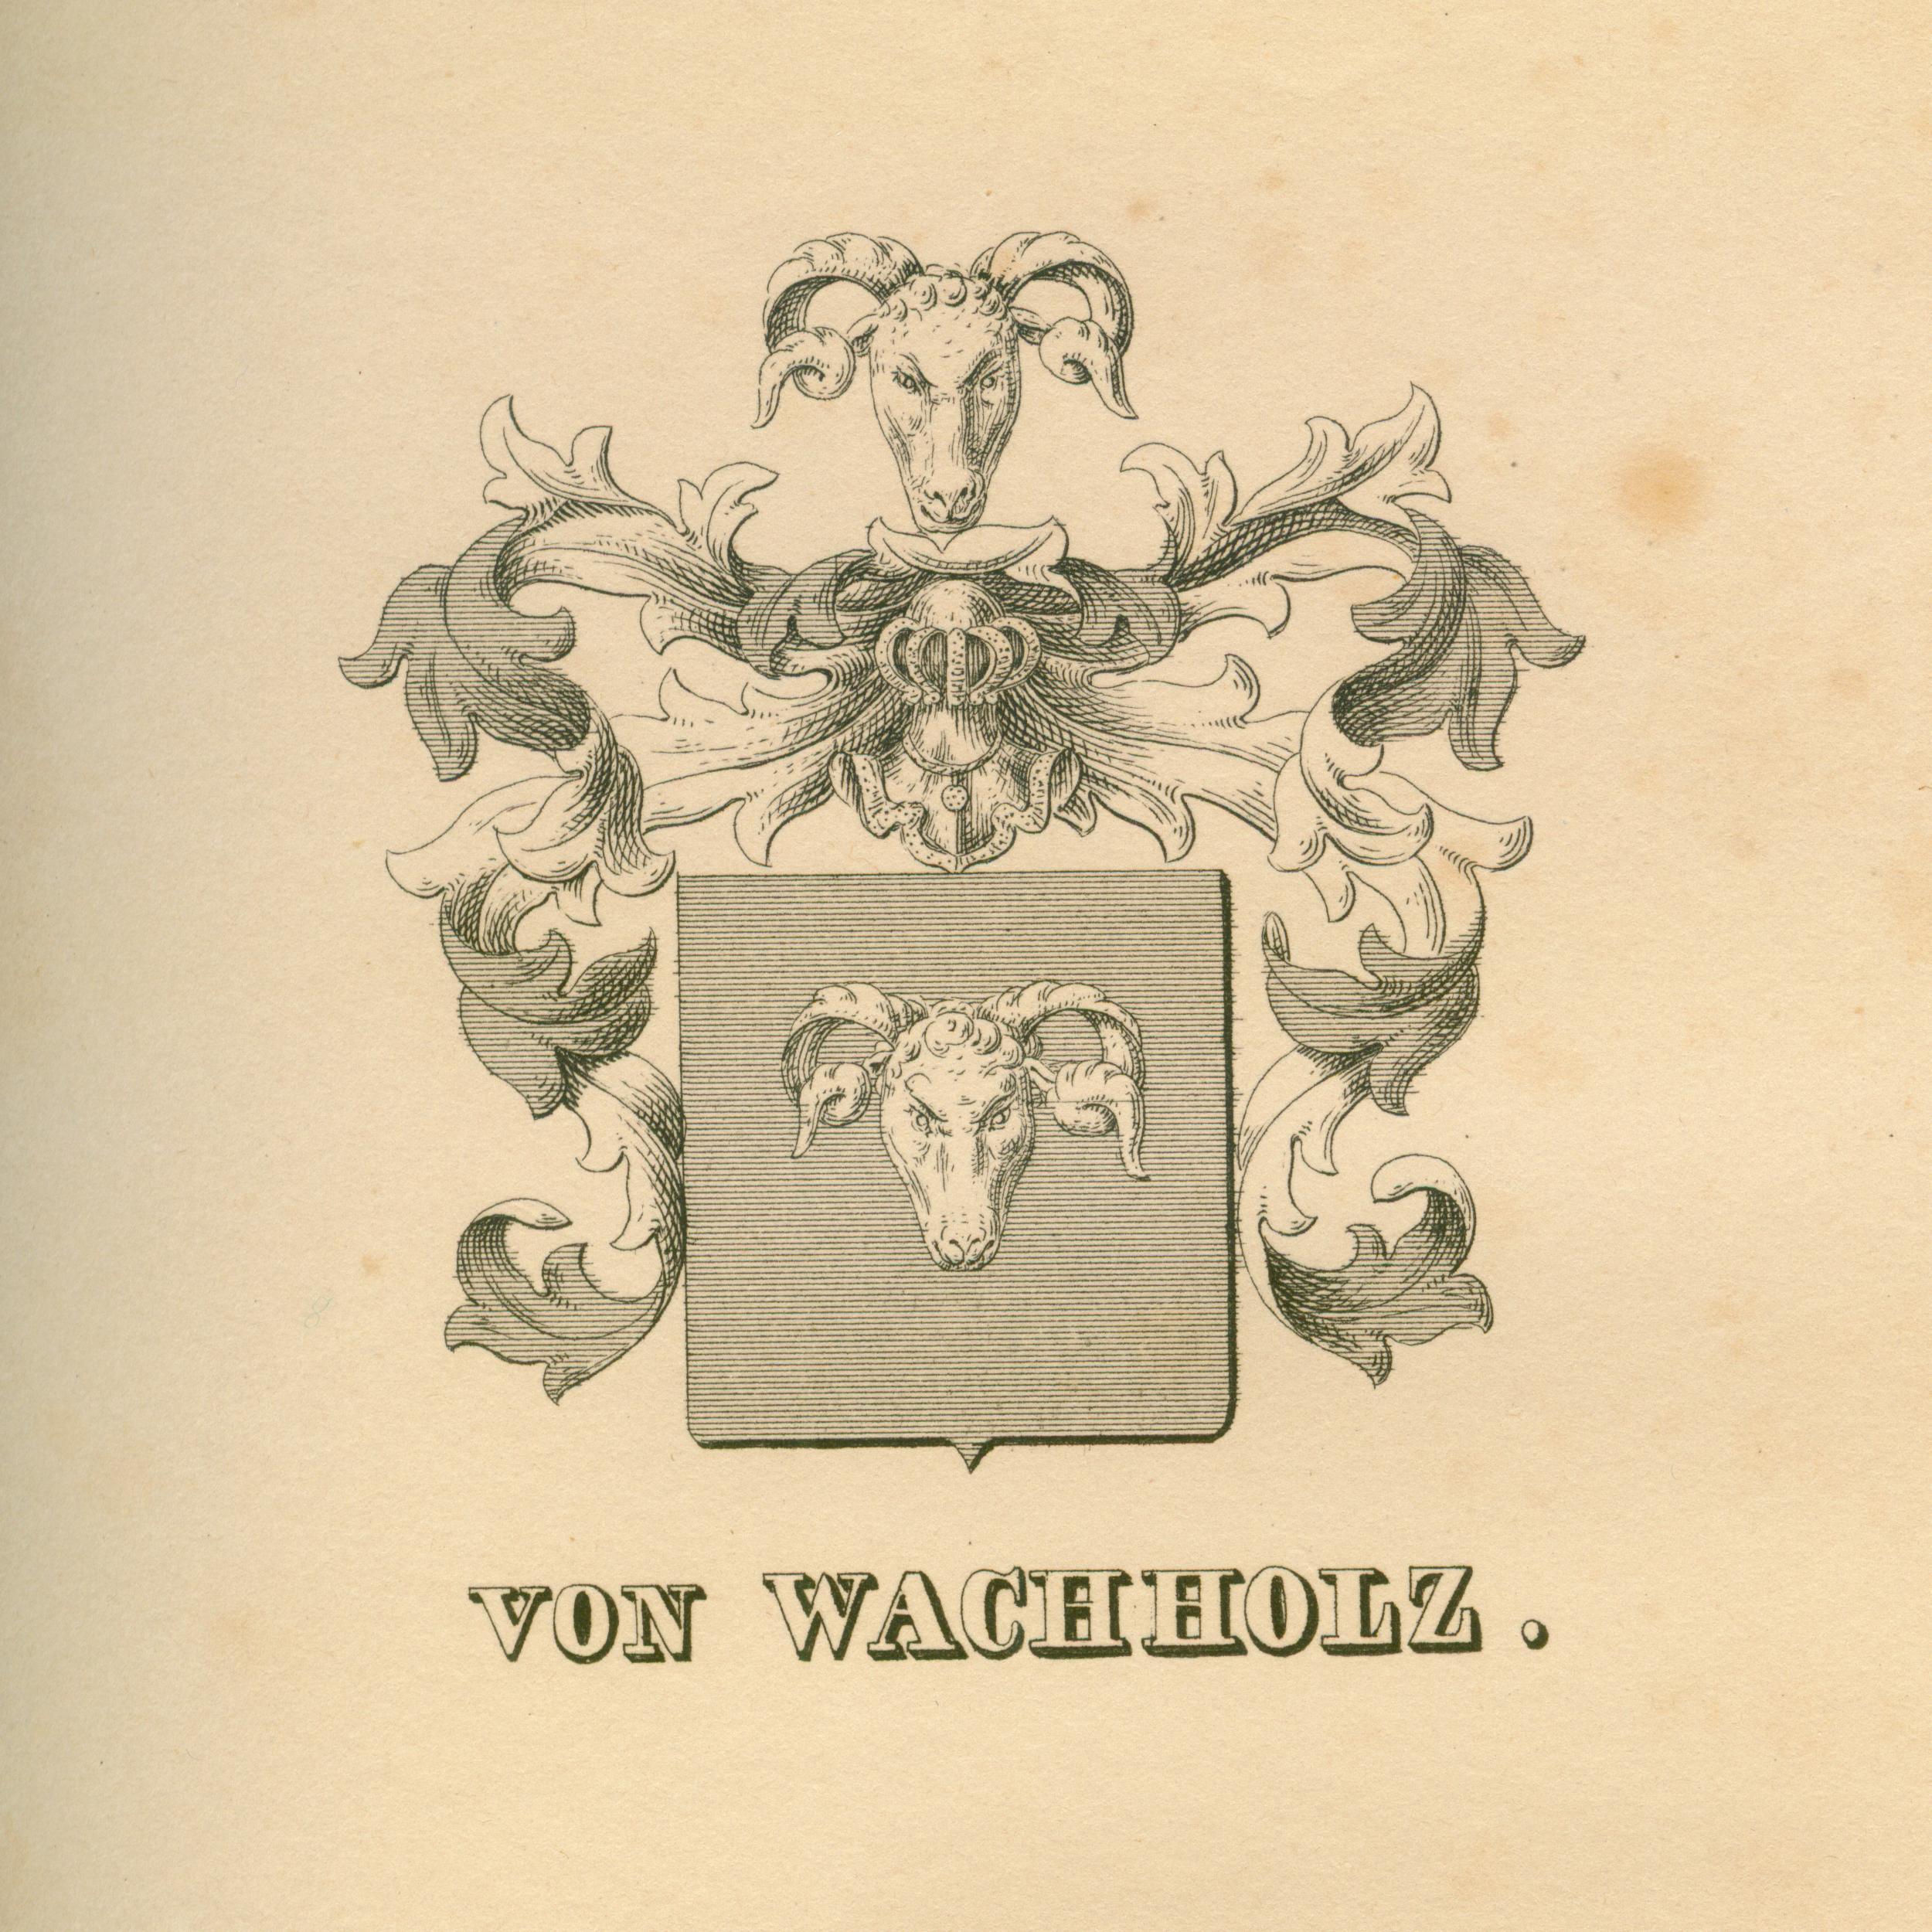 Wachholtz